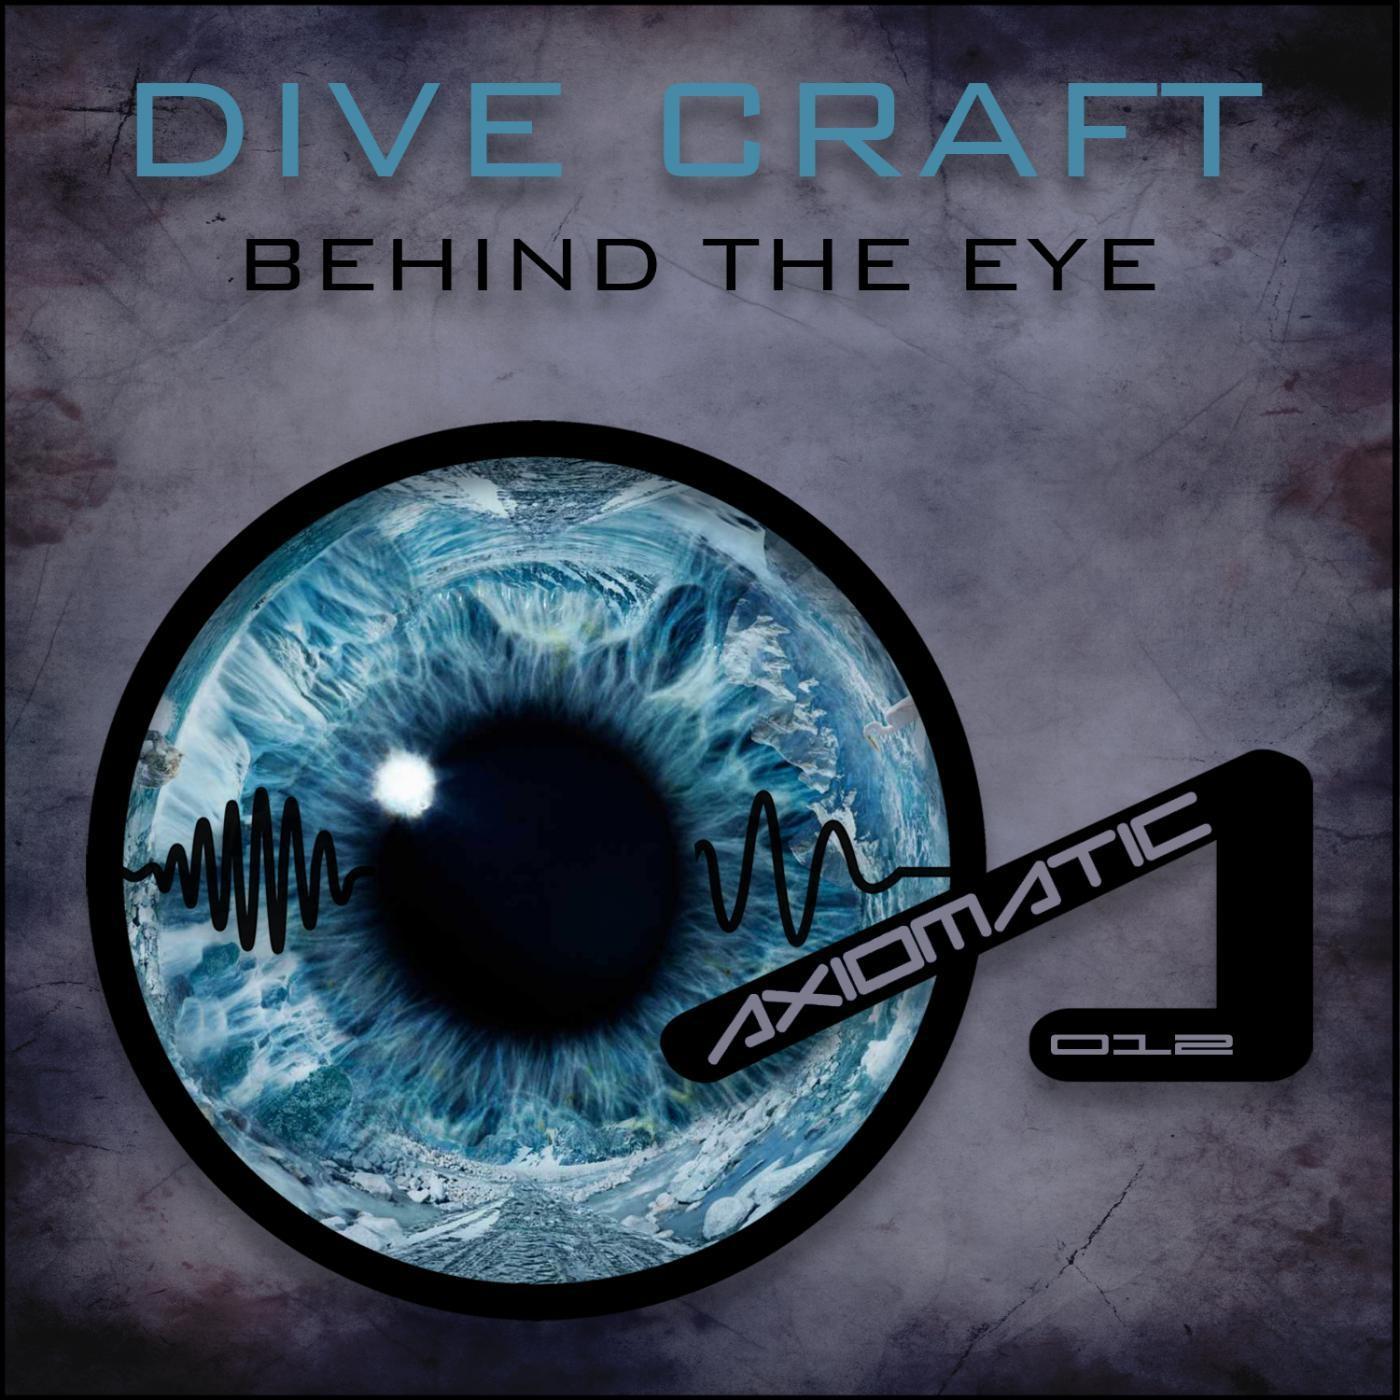 Dive Craft - Behind The Eye (Original mix)